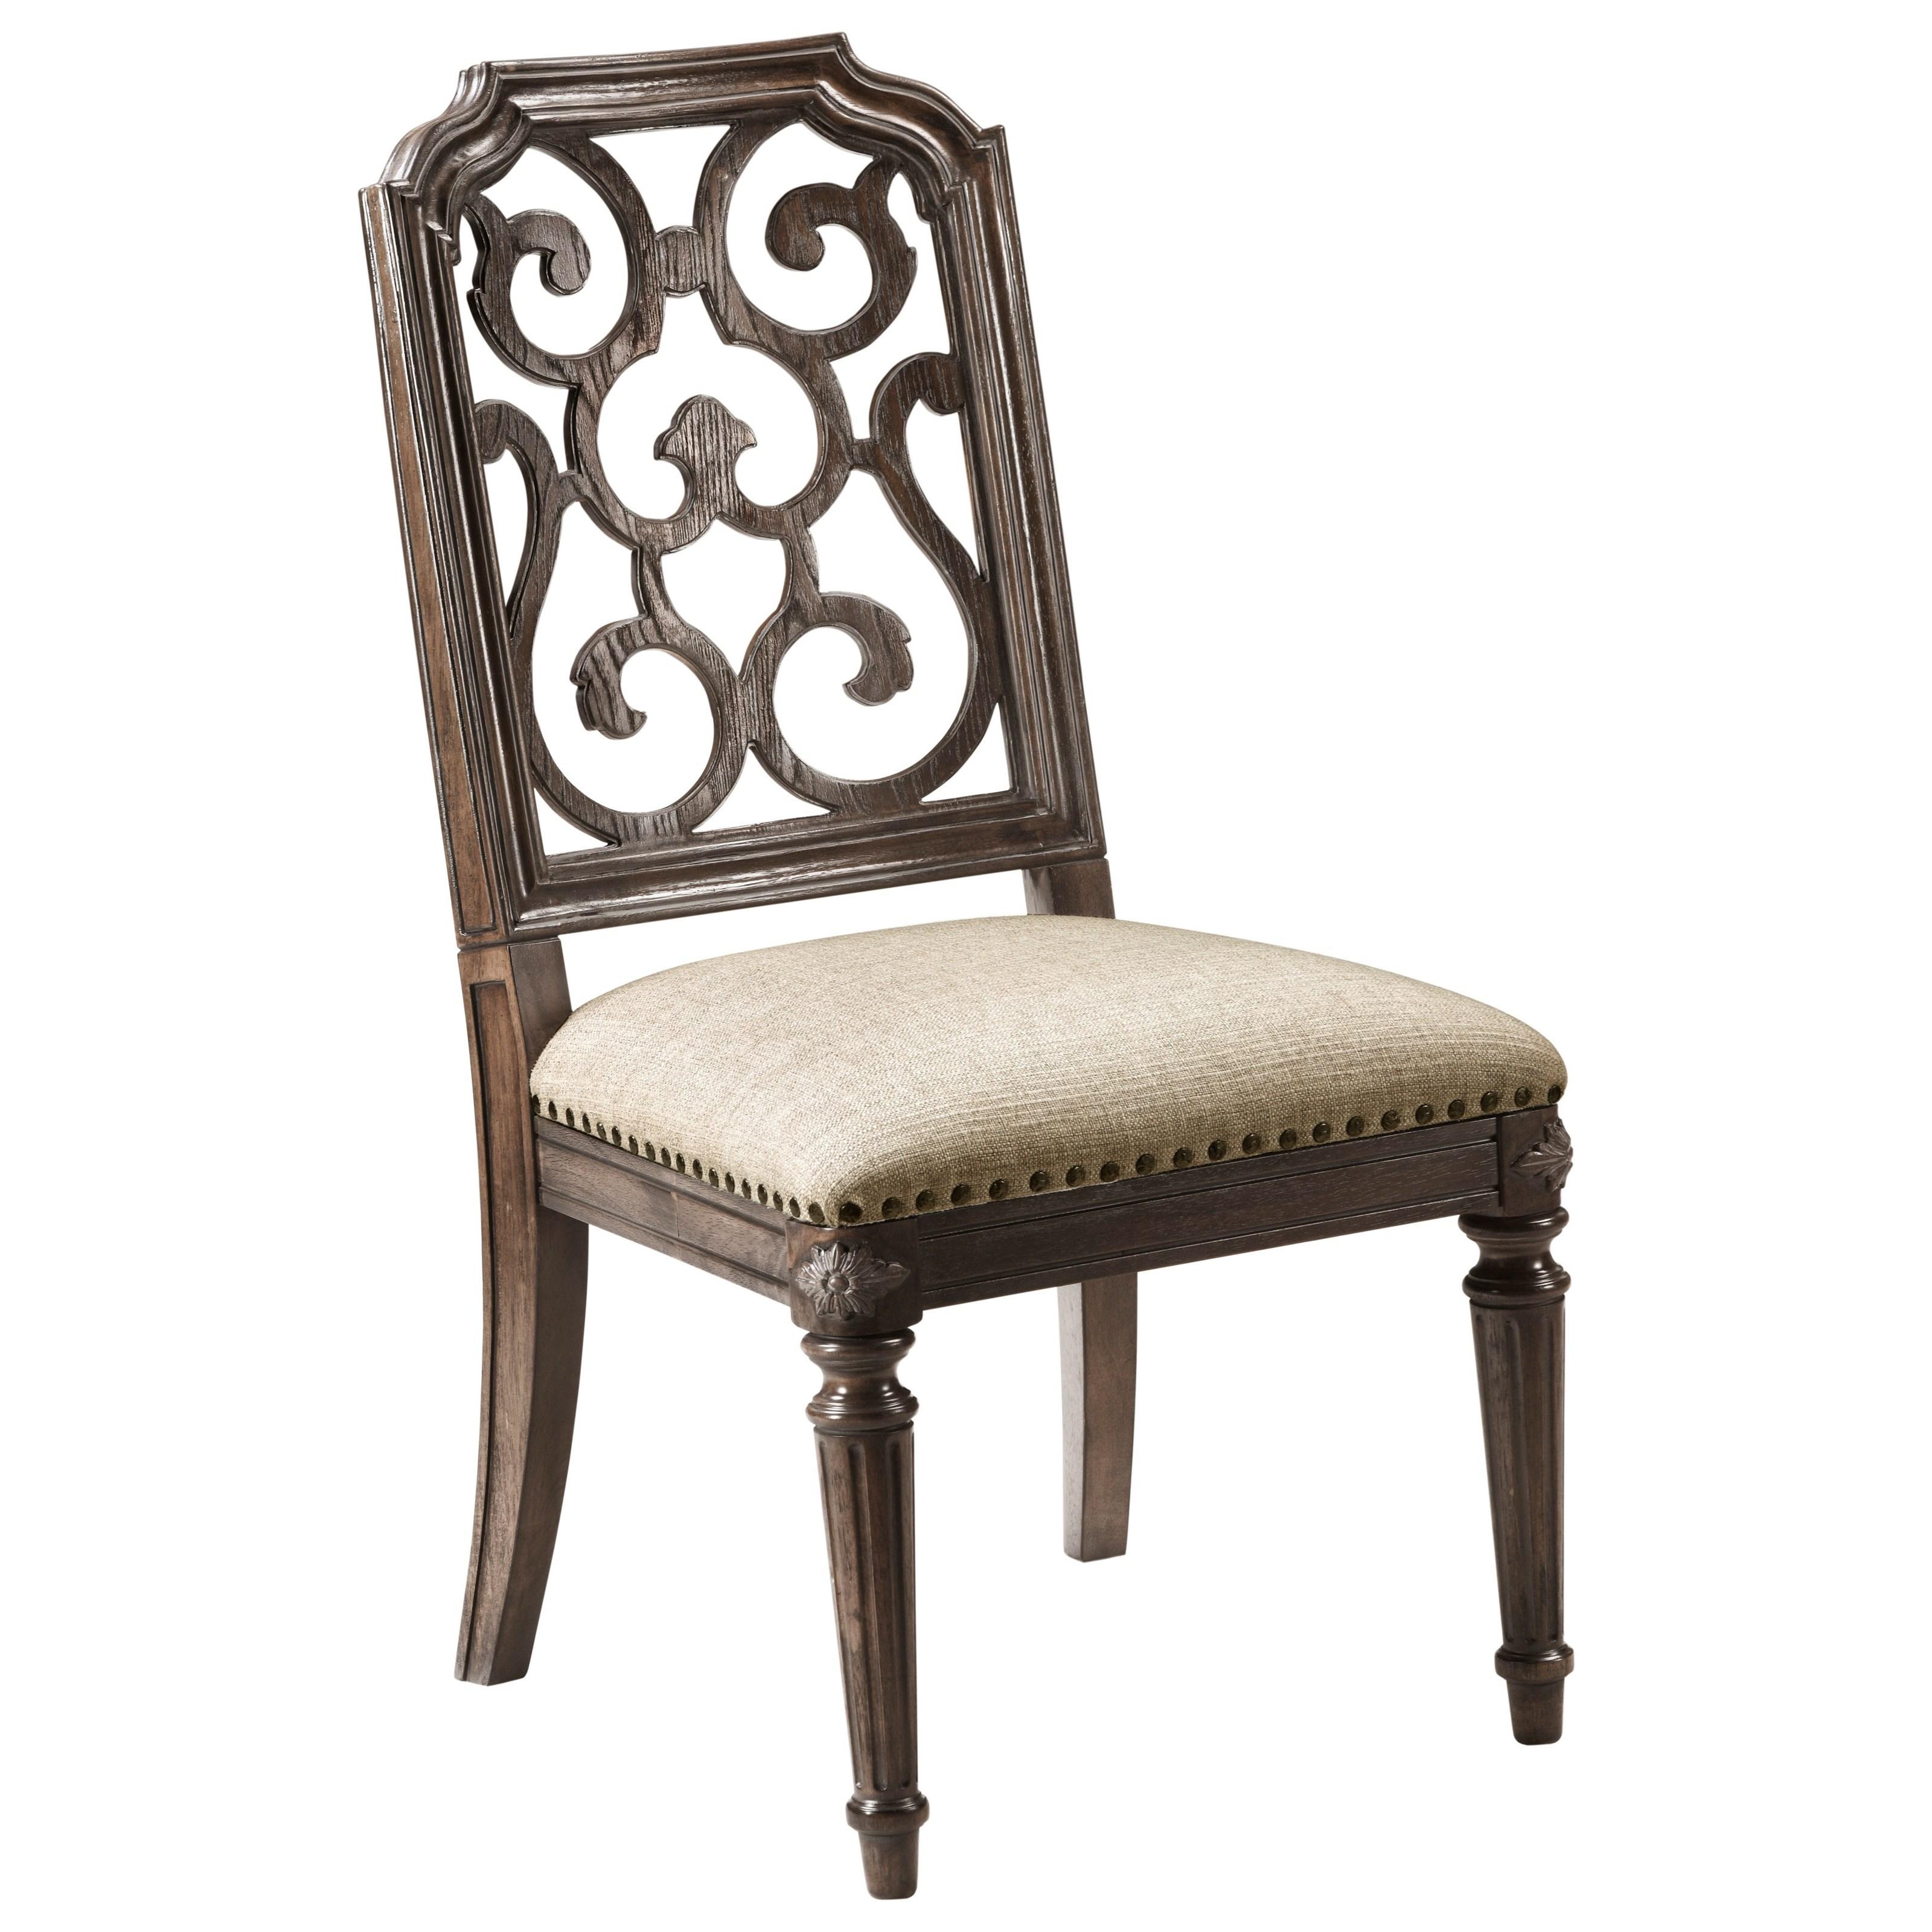 Vintage Salvage  Tristan Fret Back Side Chair  by Klien Furniture at Sprintz Furniture